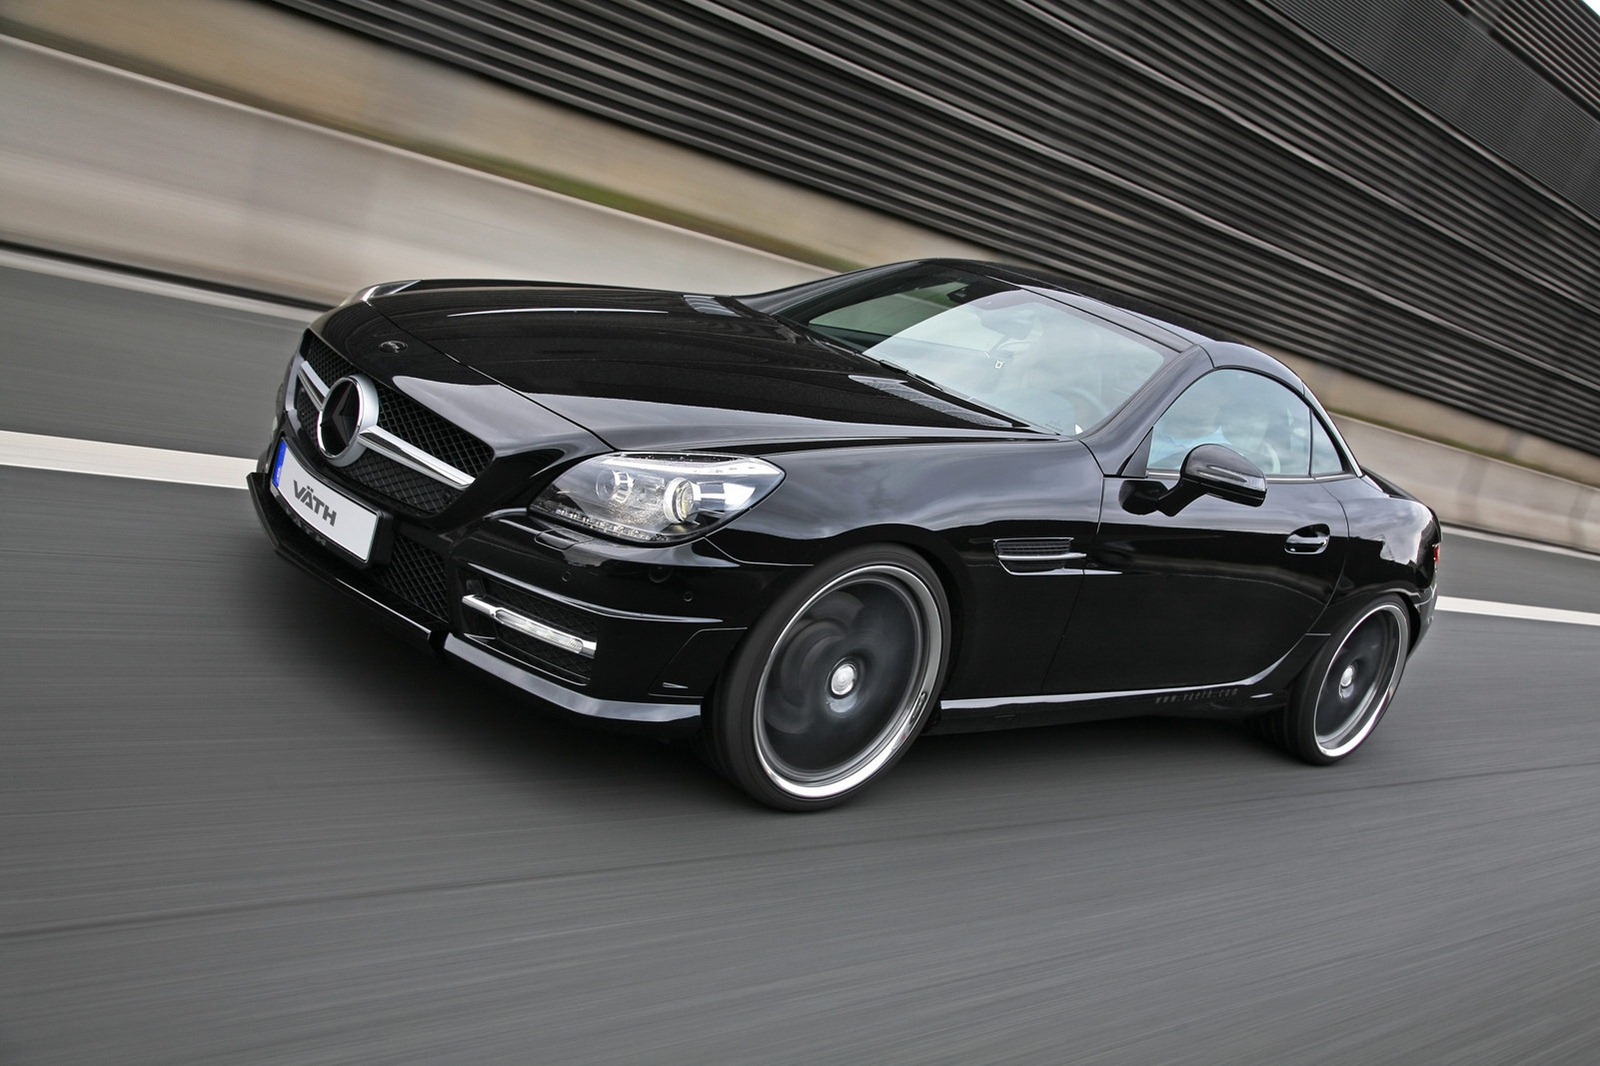 Vath Tuning Kit Based on the Mercedes SLK 350 ...